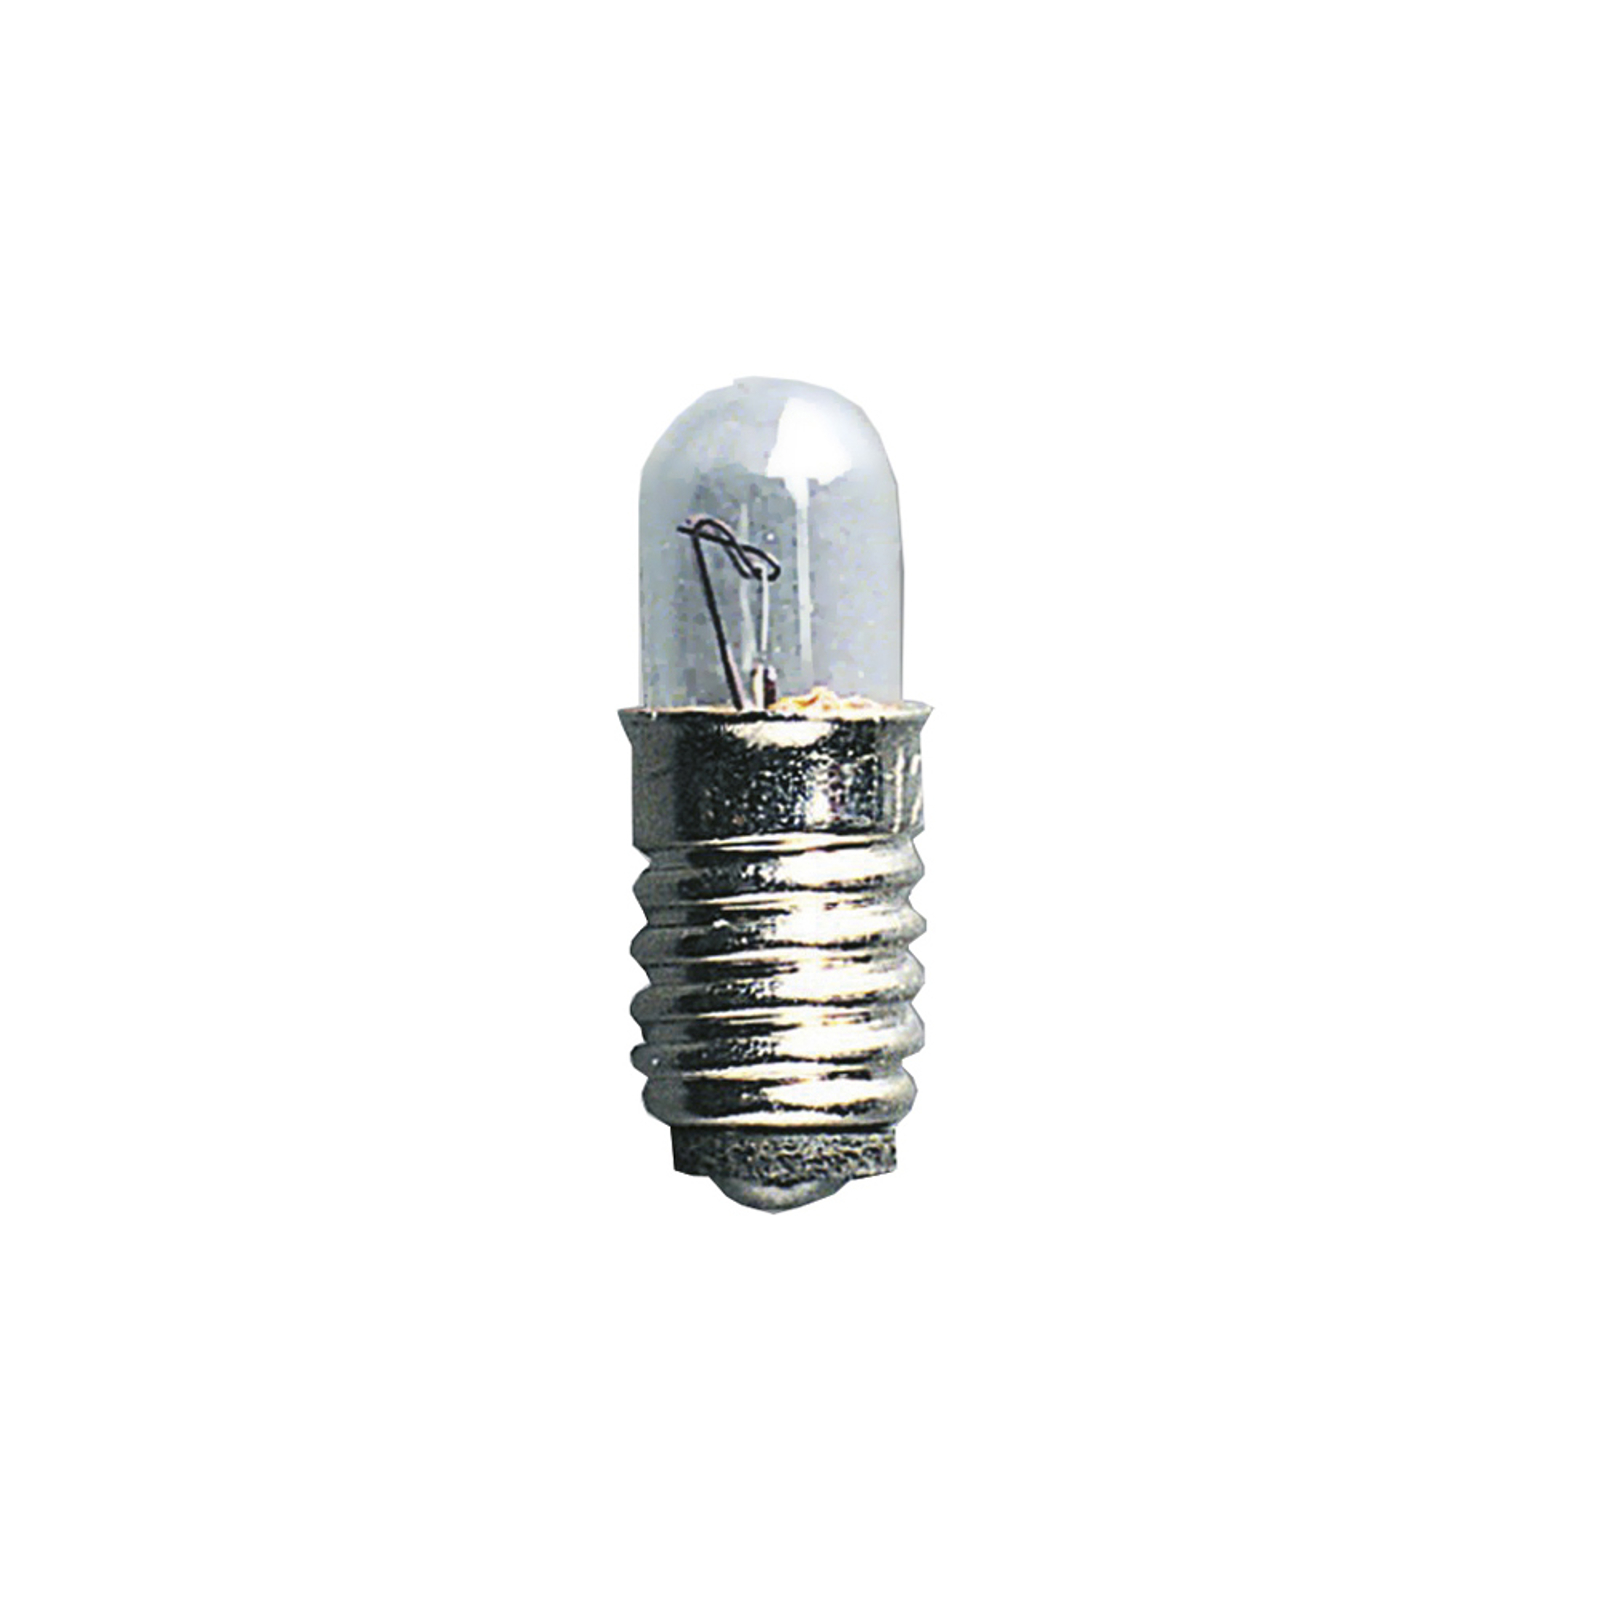 Varalamput E5 0,6 W 12 V NV-valot 5 kpl, kirkas